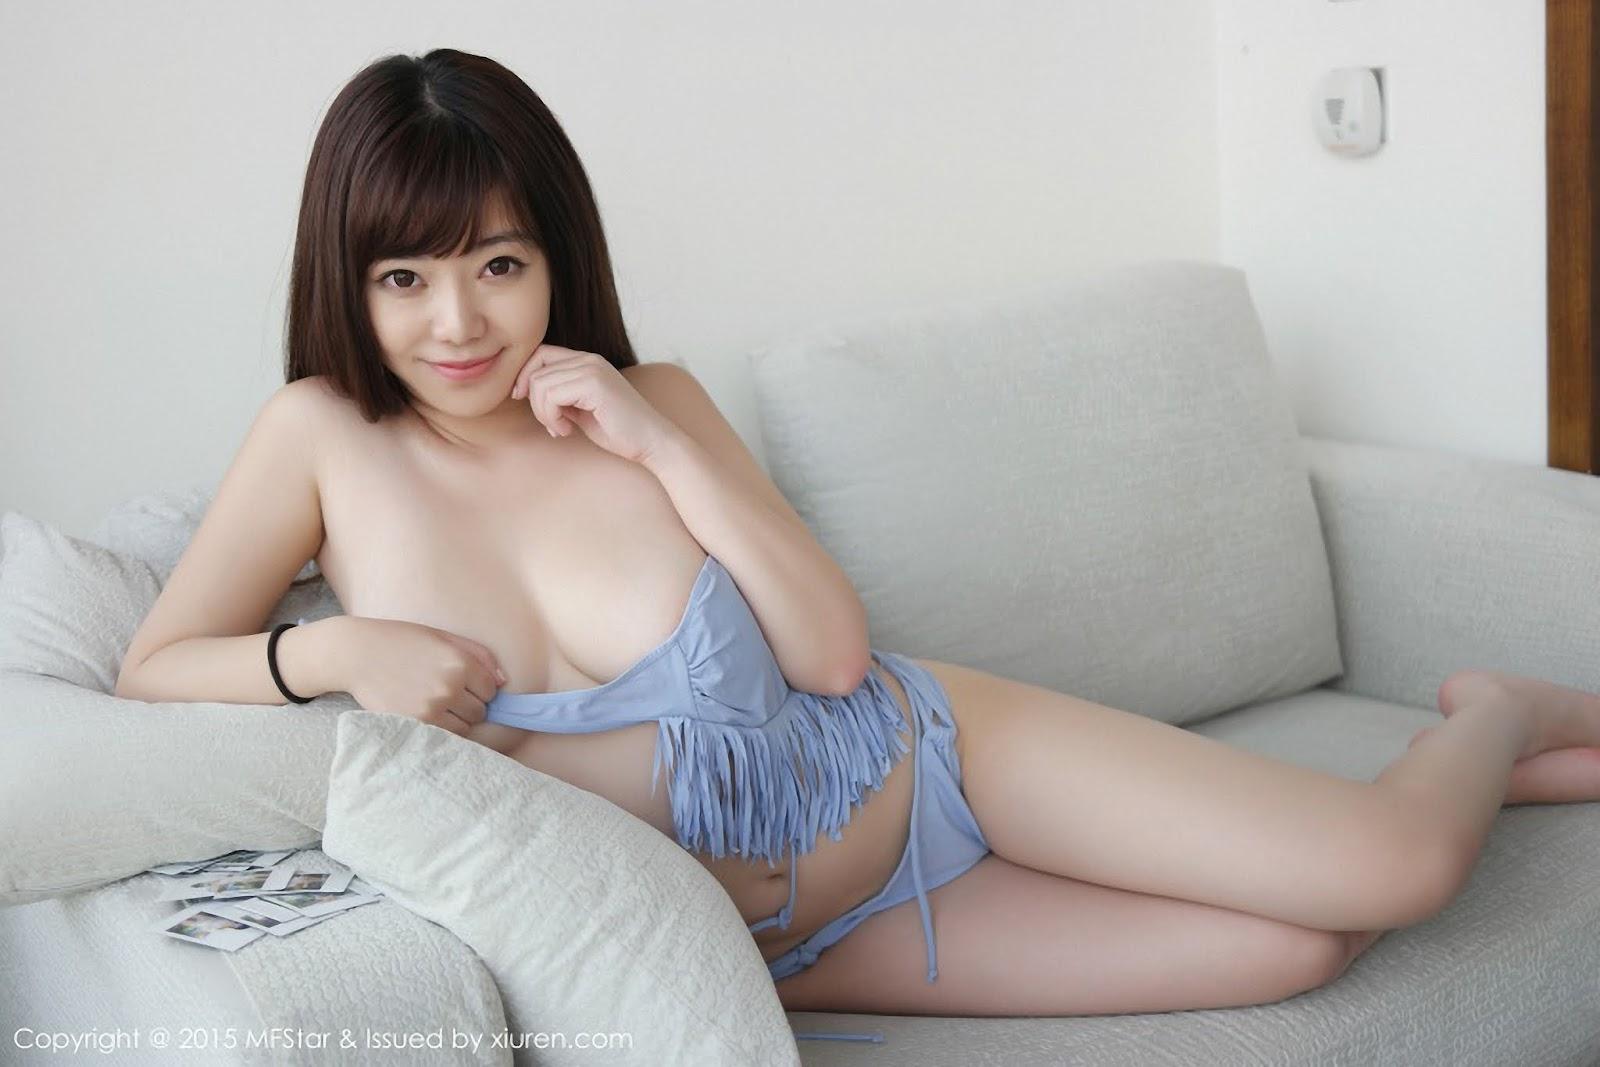 029 - MFSTAR VOL.3 FAYE Hot Nude Girl